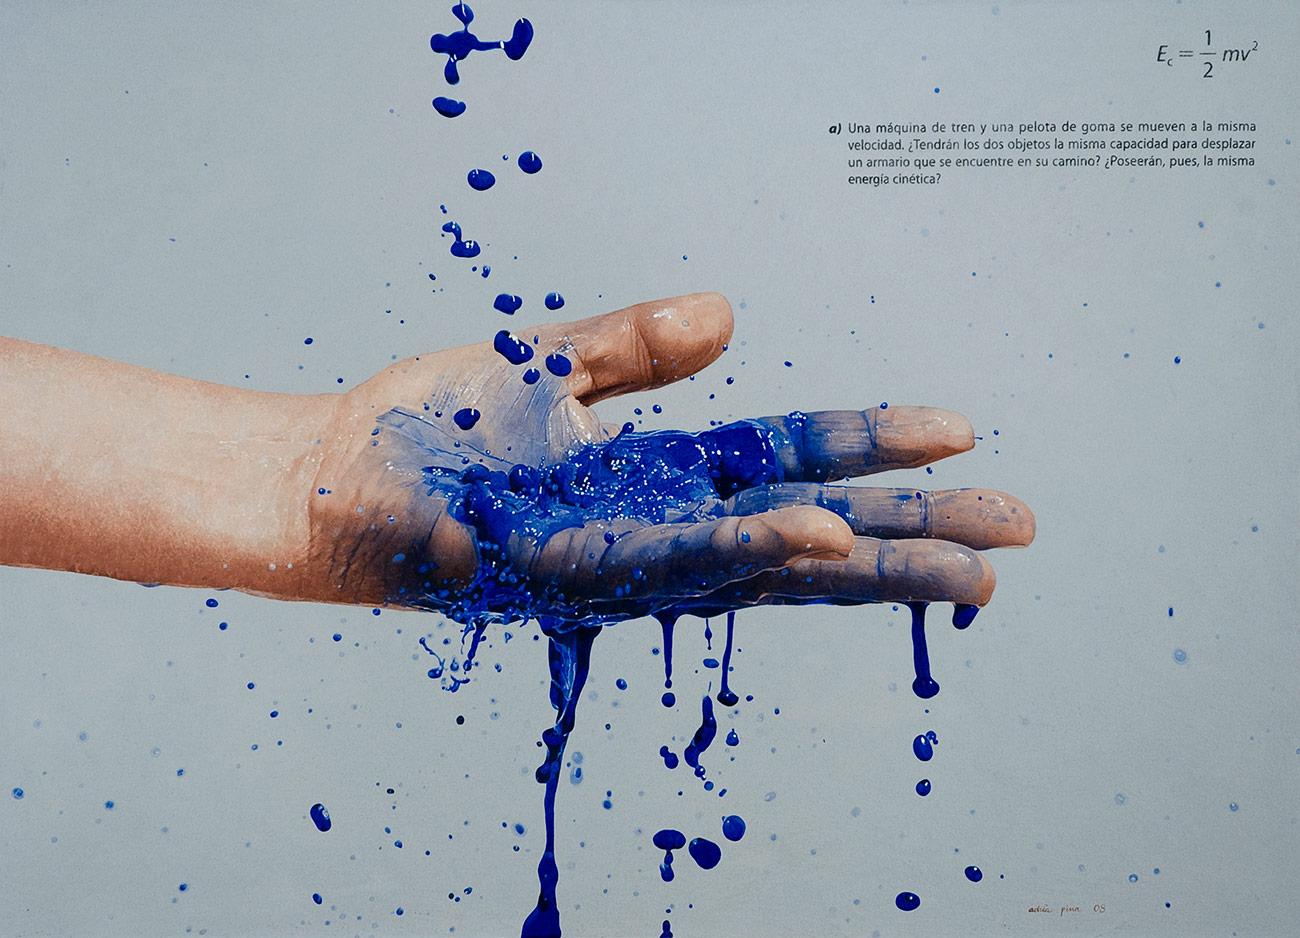 """MA, blavet, a)"" 2008 Acrílico, polvo de marmol y óleo s/tela 72 x 100 cm"